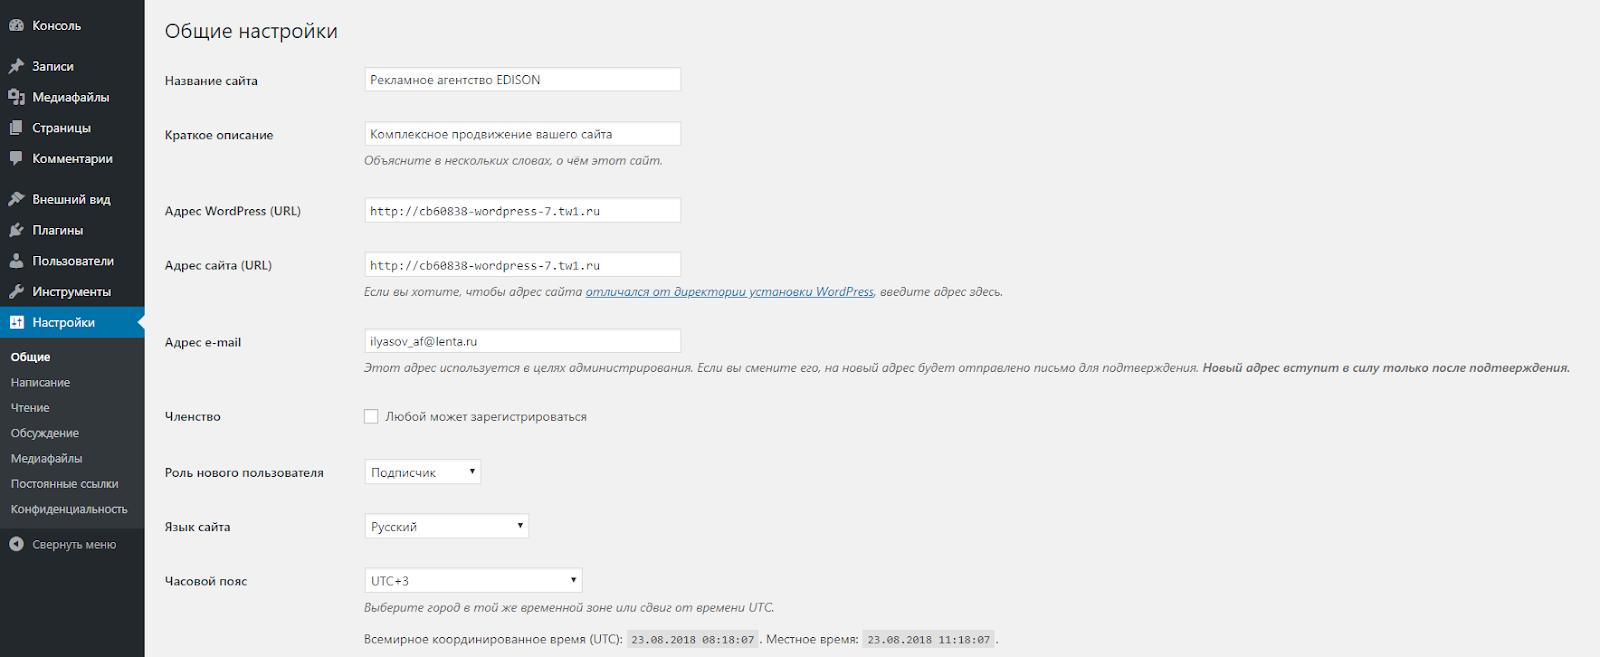 Общие настройки в CMS Wordpress